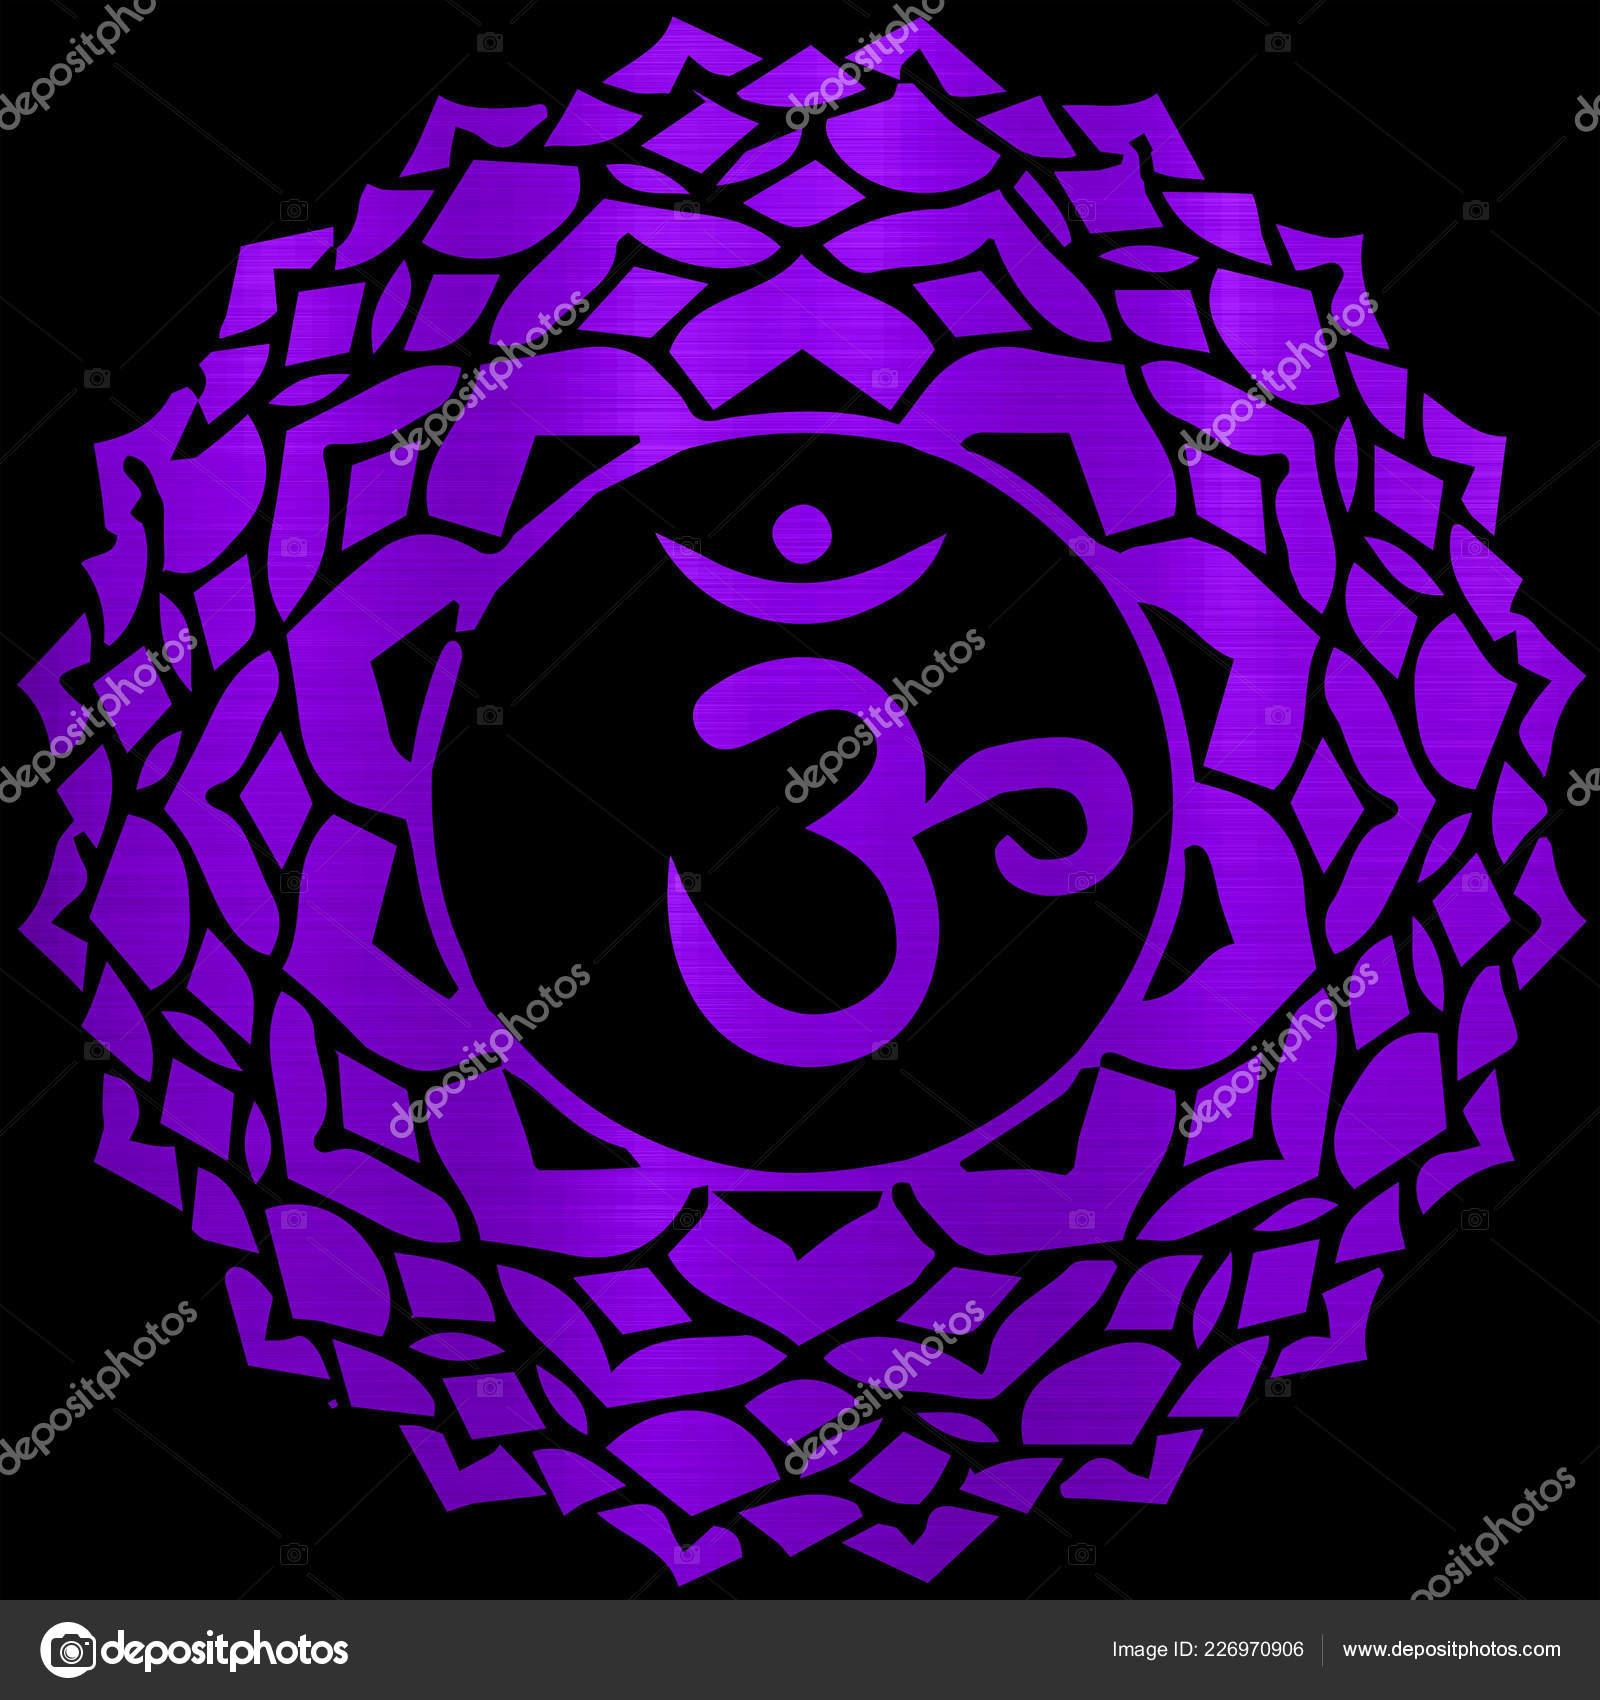 Sahasrara Chakra Energy Meditation Yoga Hindu Metallic